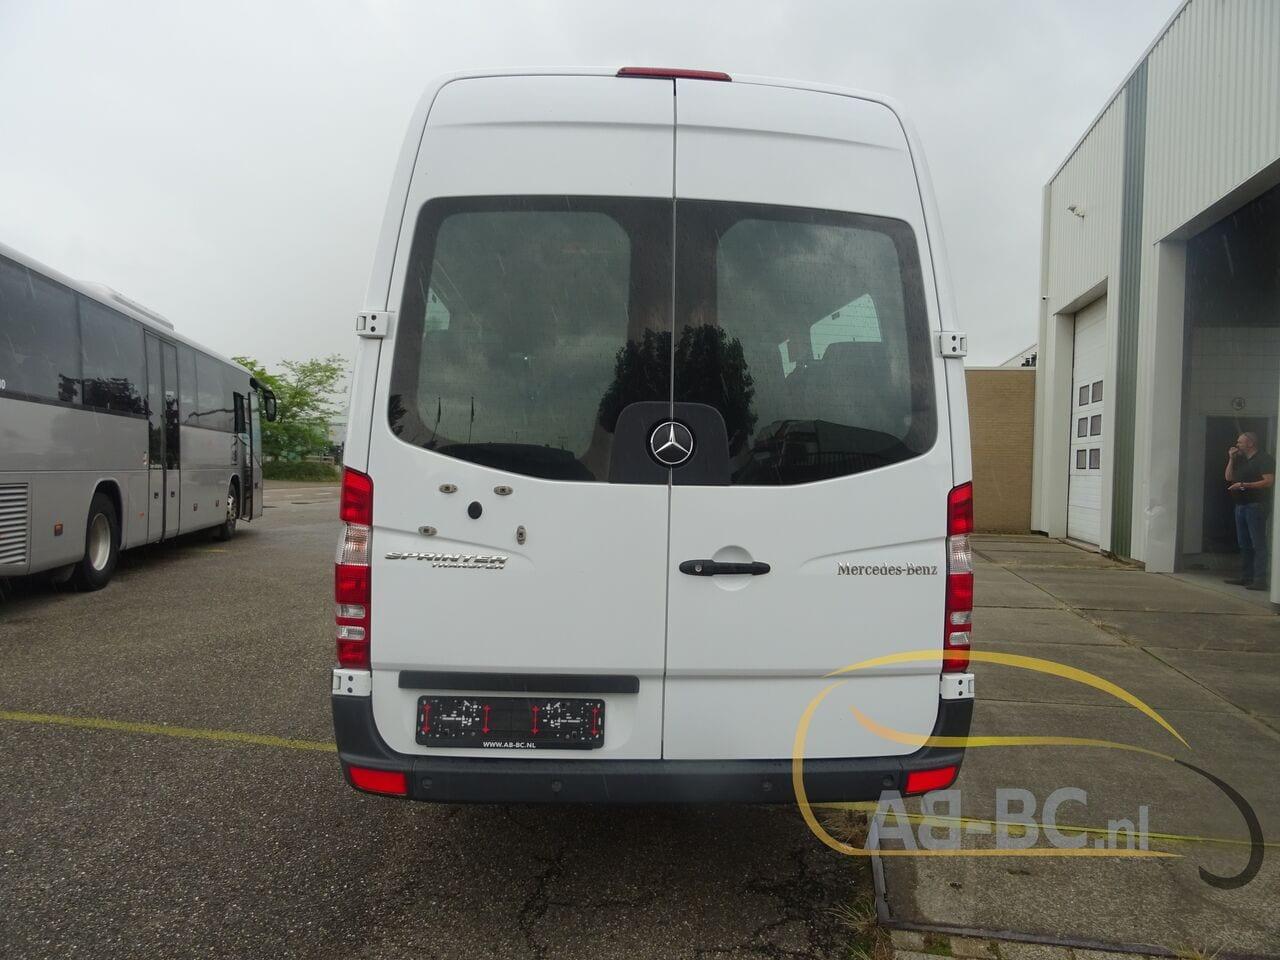 coach-busMERCEDES-BENZ-516-CDI-Sprinter-Transfer-45-23-Seats-EURO-6---1625493789215585324_big_494ba2ca7e8ccfad4f92e7401df1d813--21060112394245379500